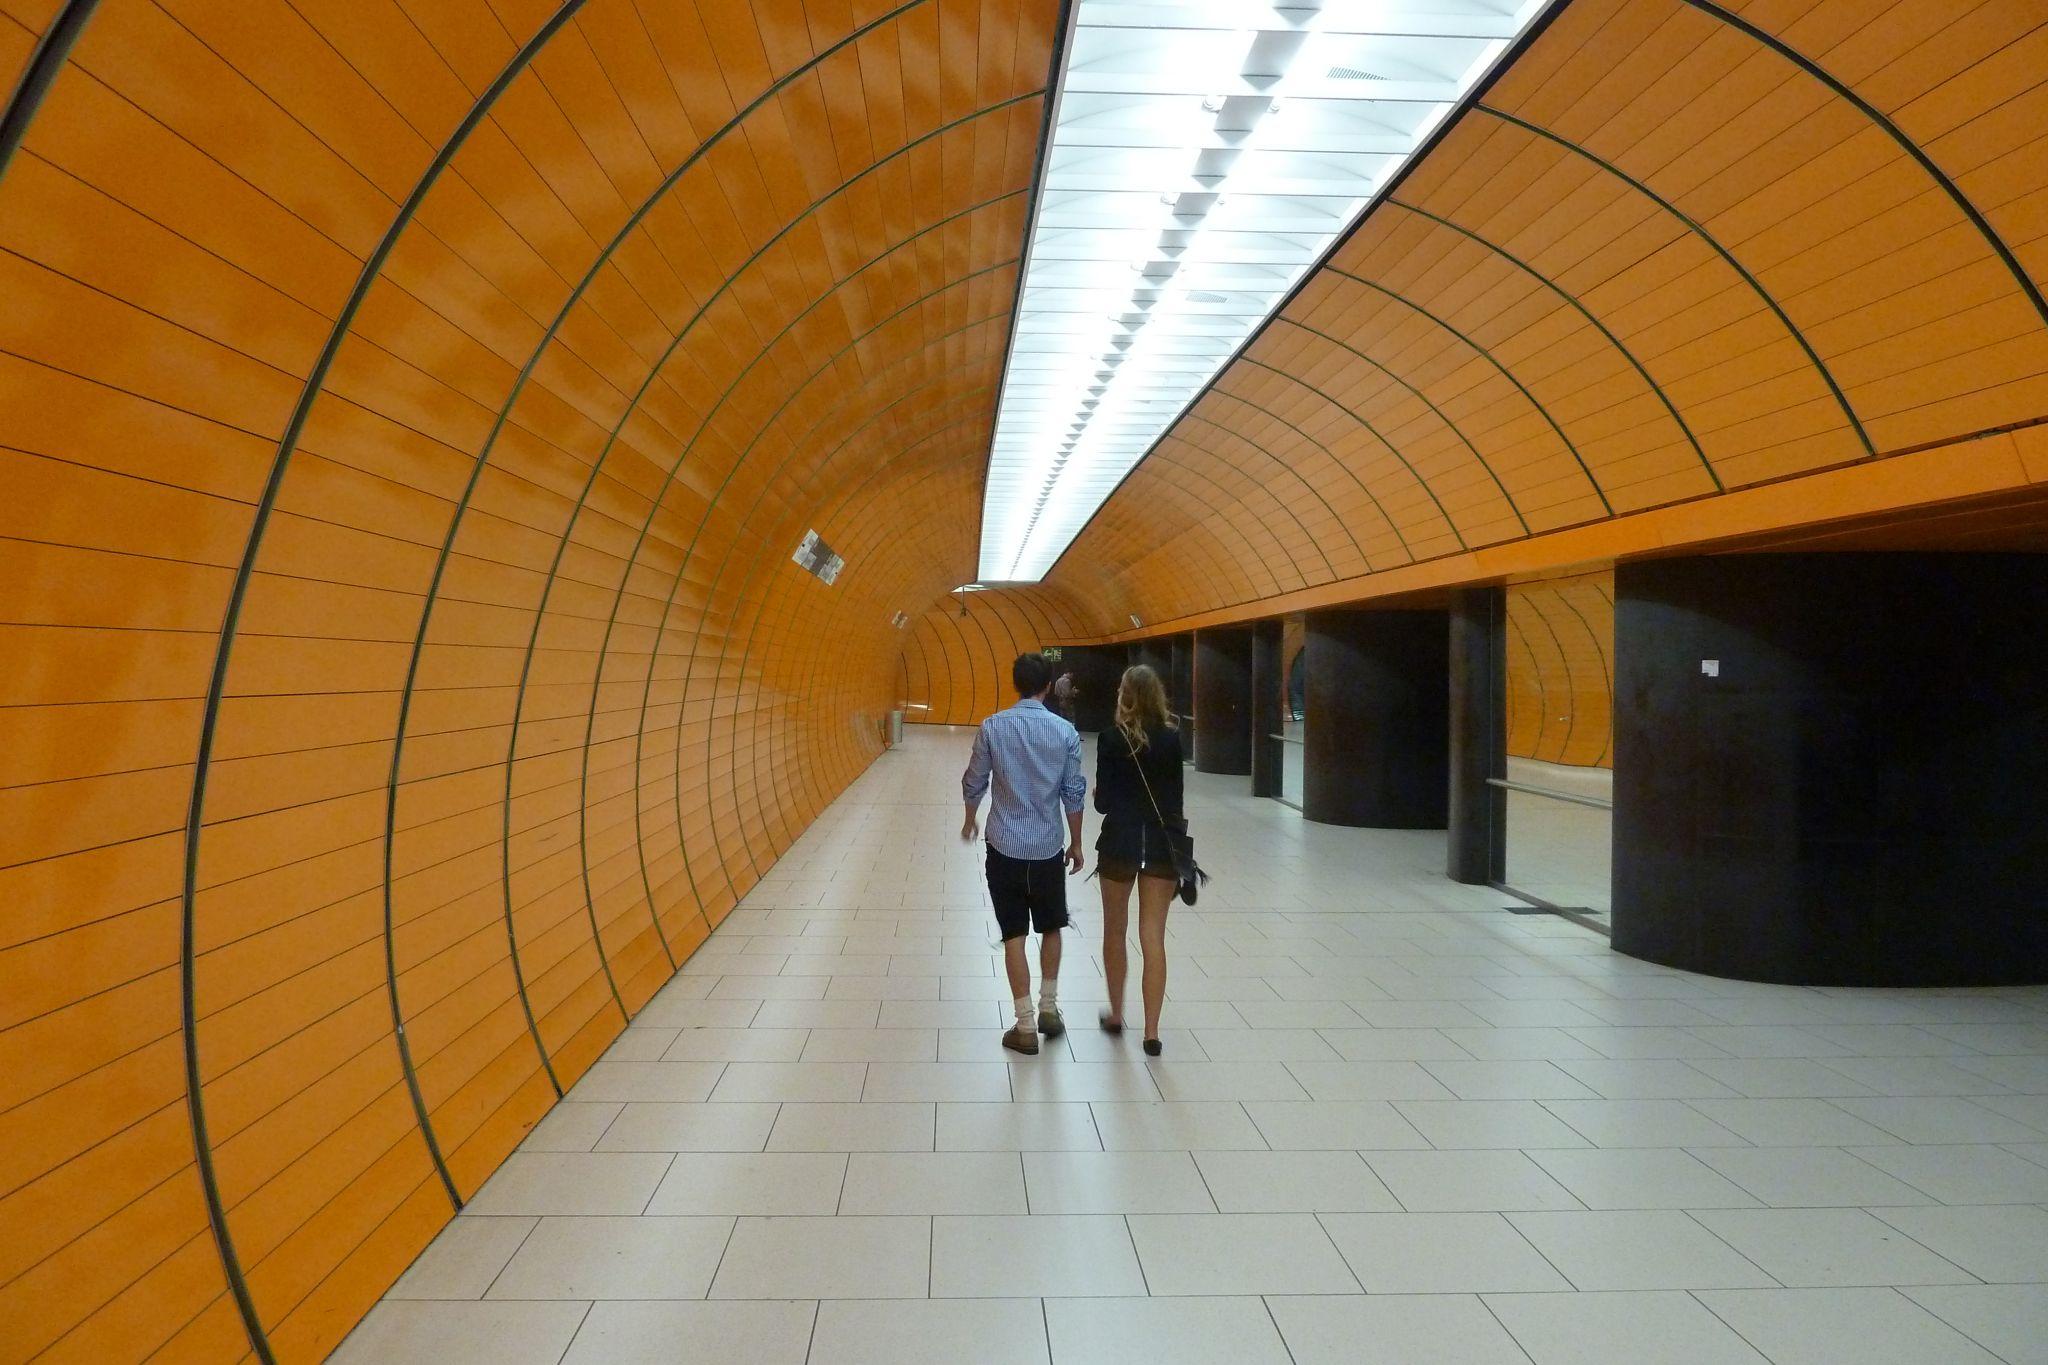 Marienplatz Subway Station, Germany